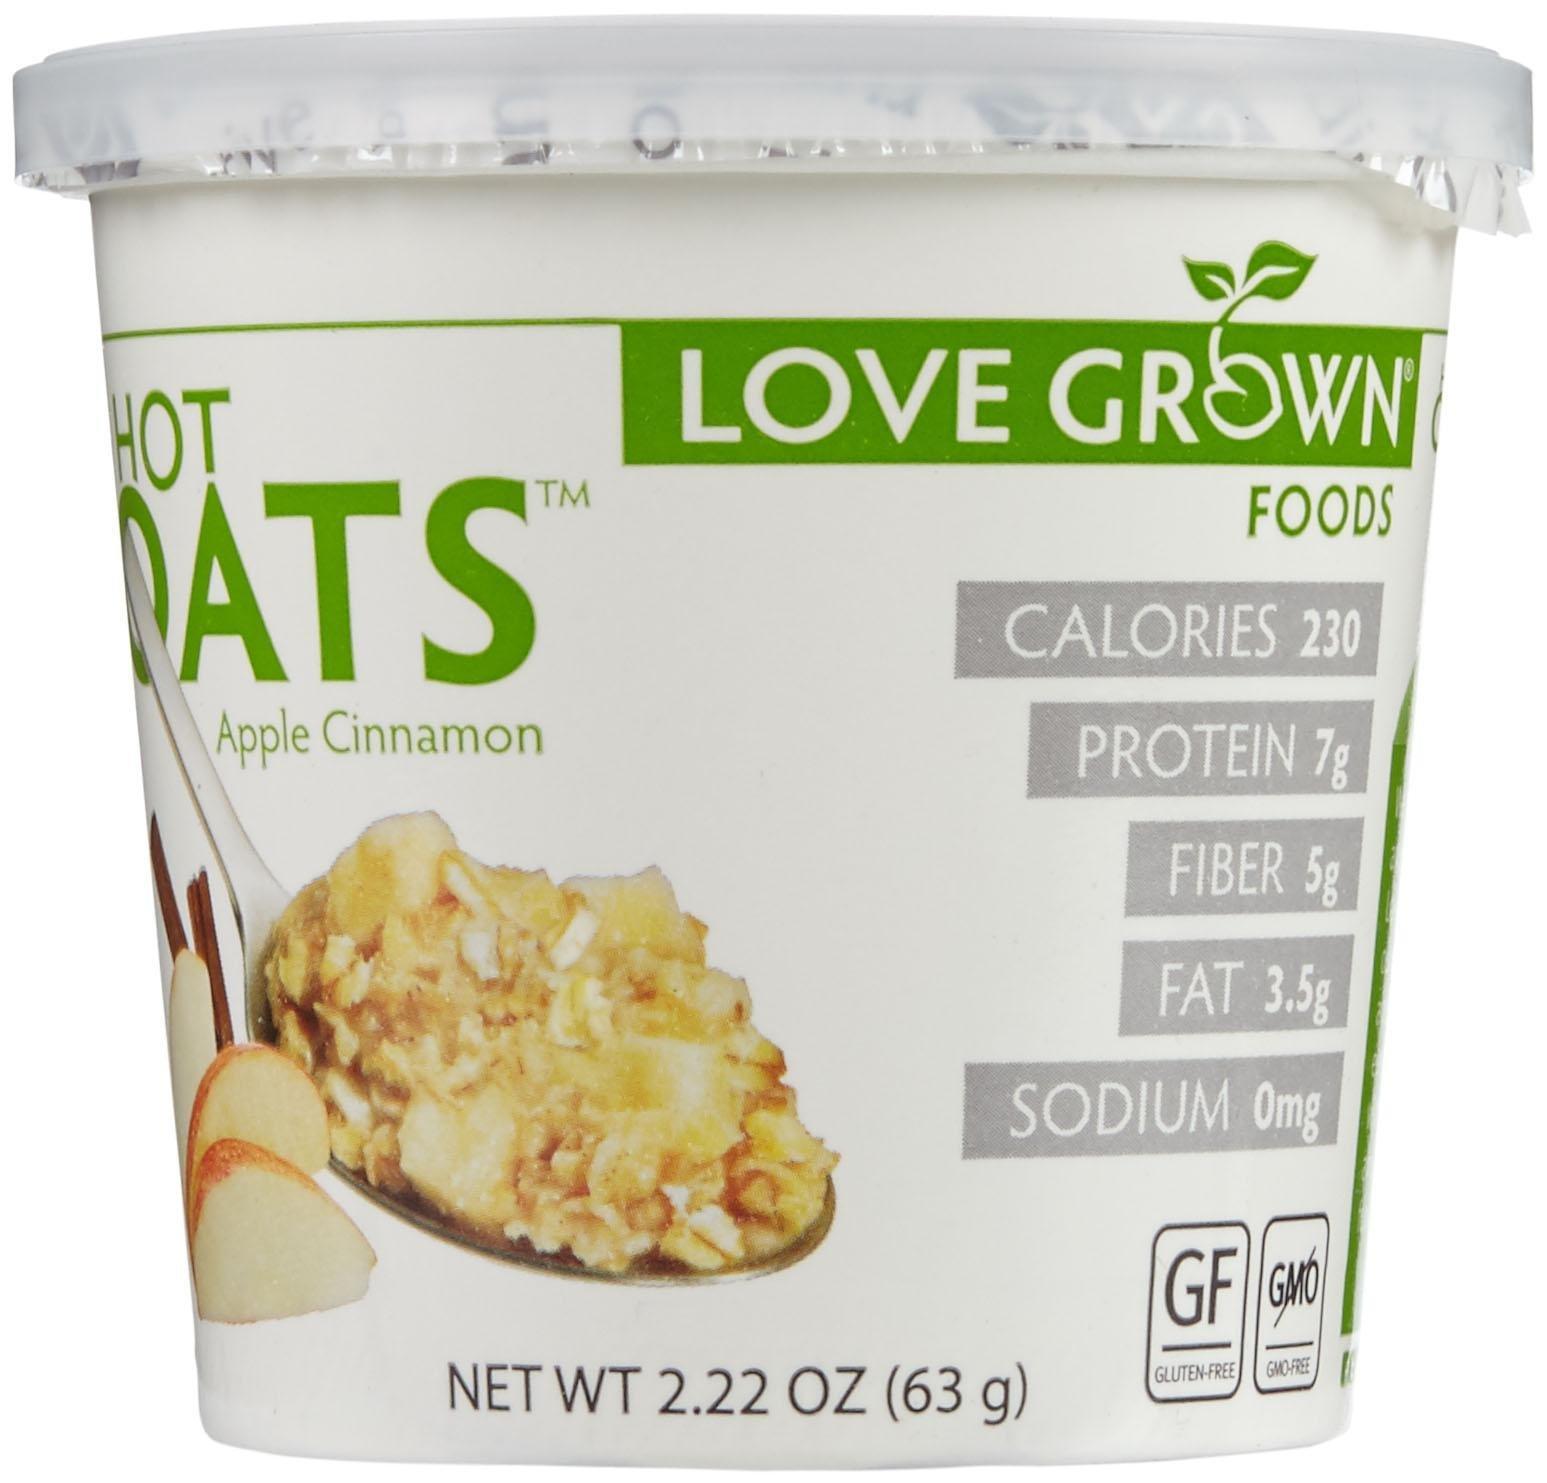 Love Grown Foods Hot Oats - Apple Cinnamon - 2.22 oz - 8 Pack